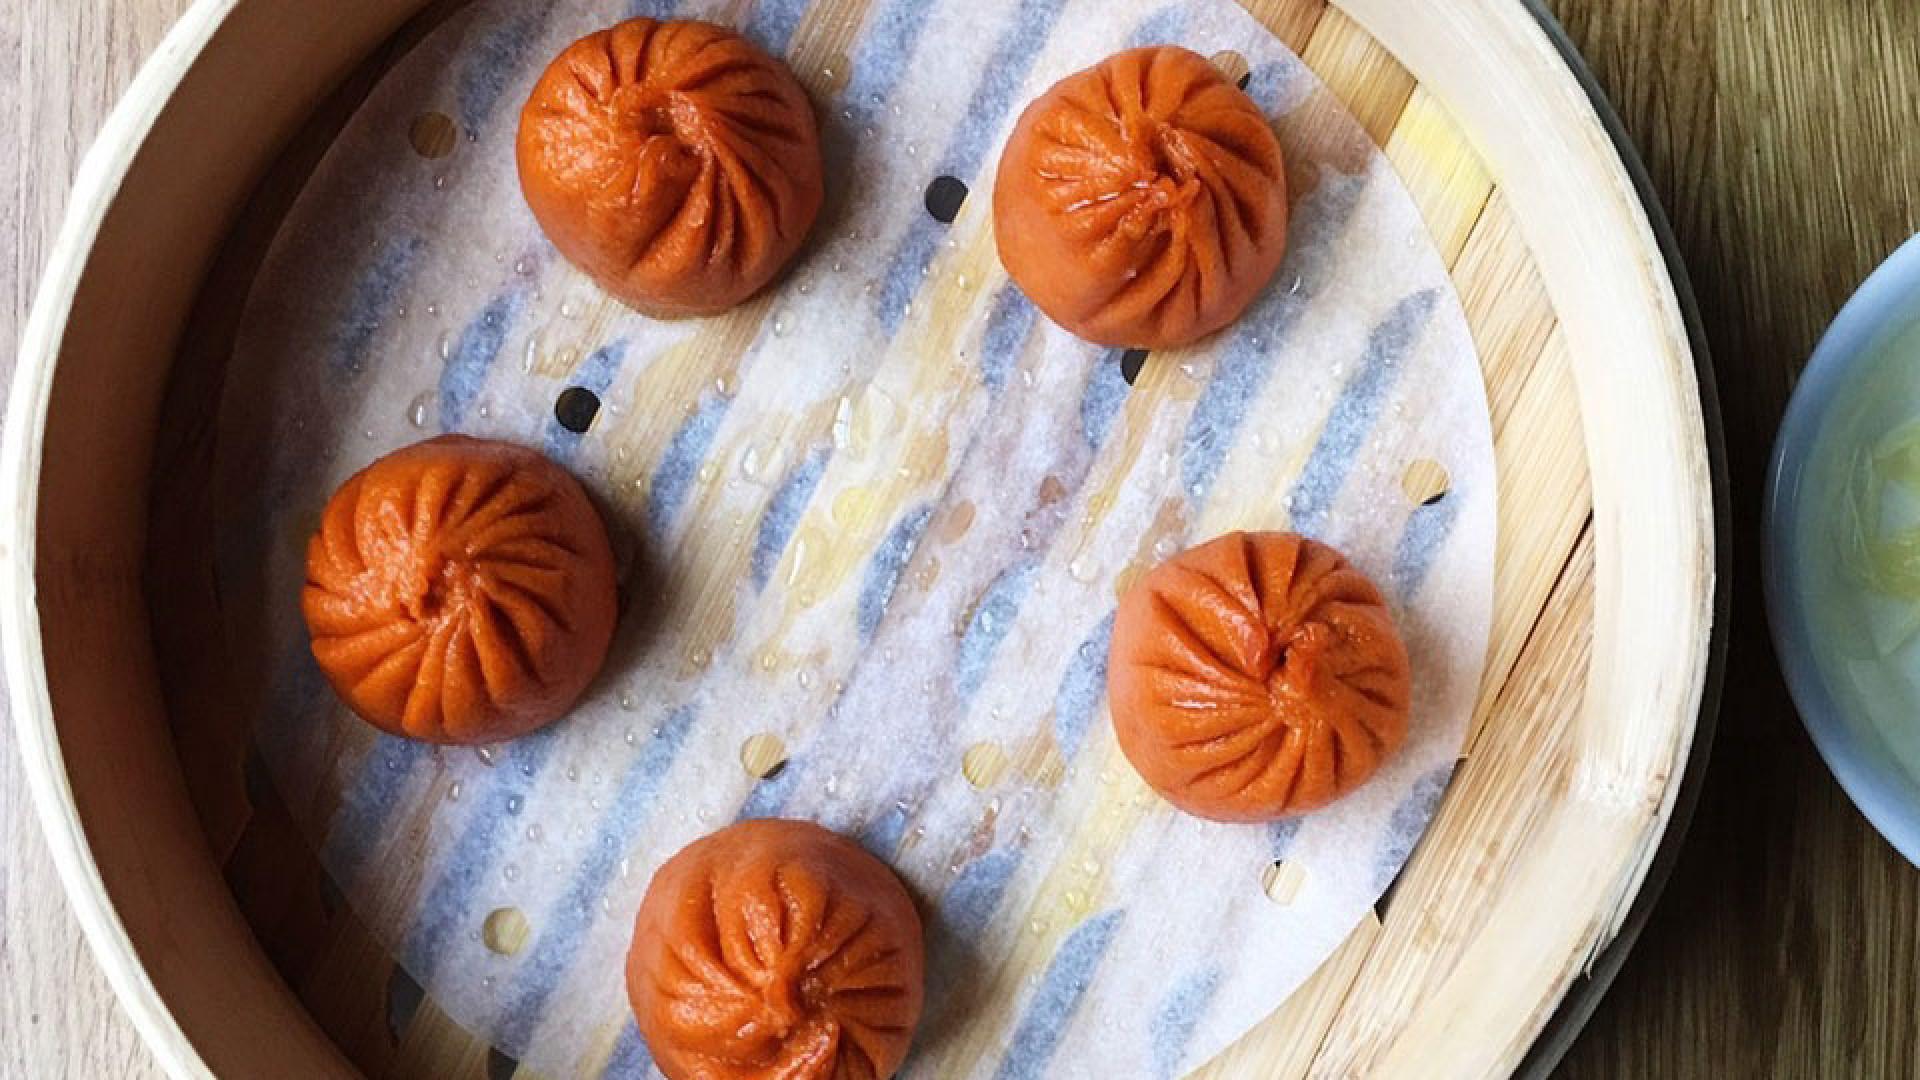 'Lucky red lantern' xiao long bao soup dumplings from Romilly Street's BaoziInn